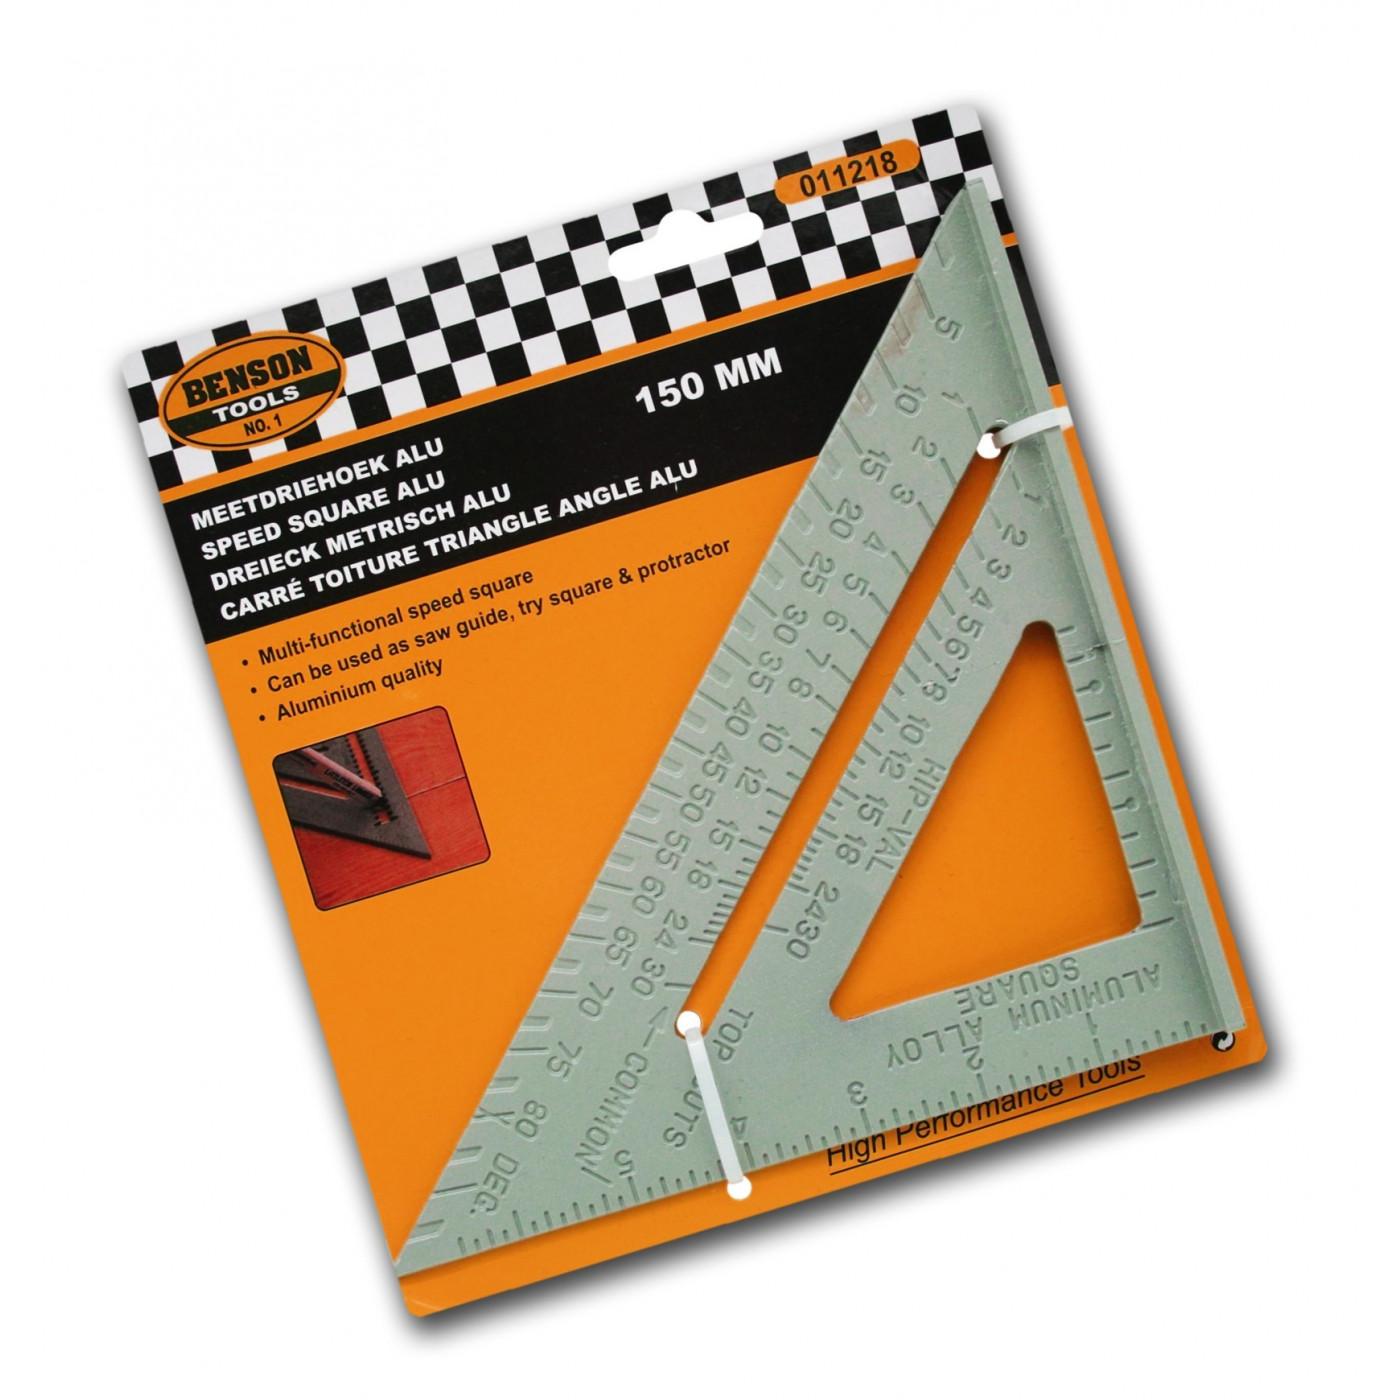 Géo triangle et tige de mesure robustes (aluminium), 150 mm